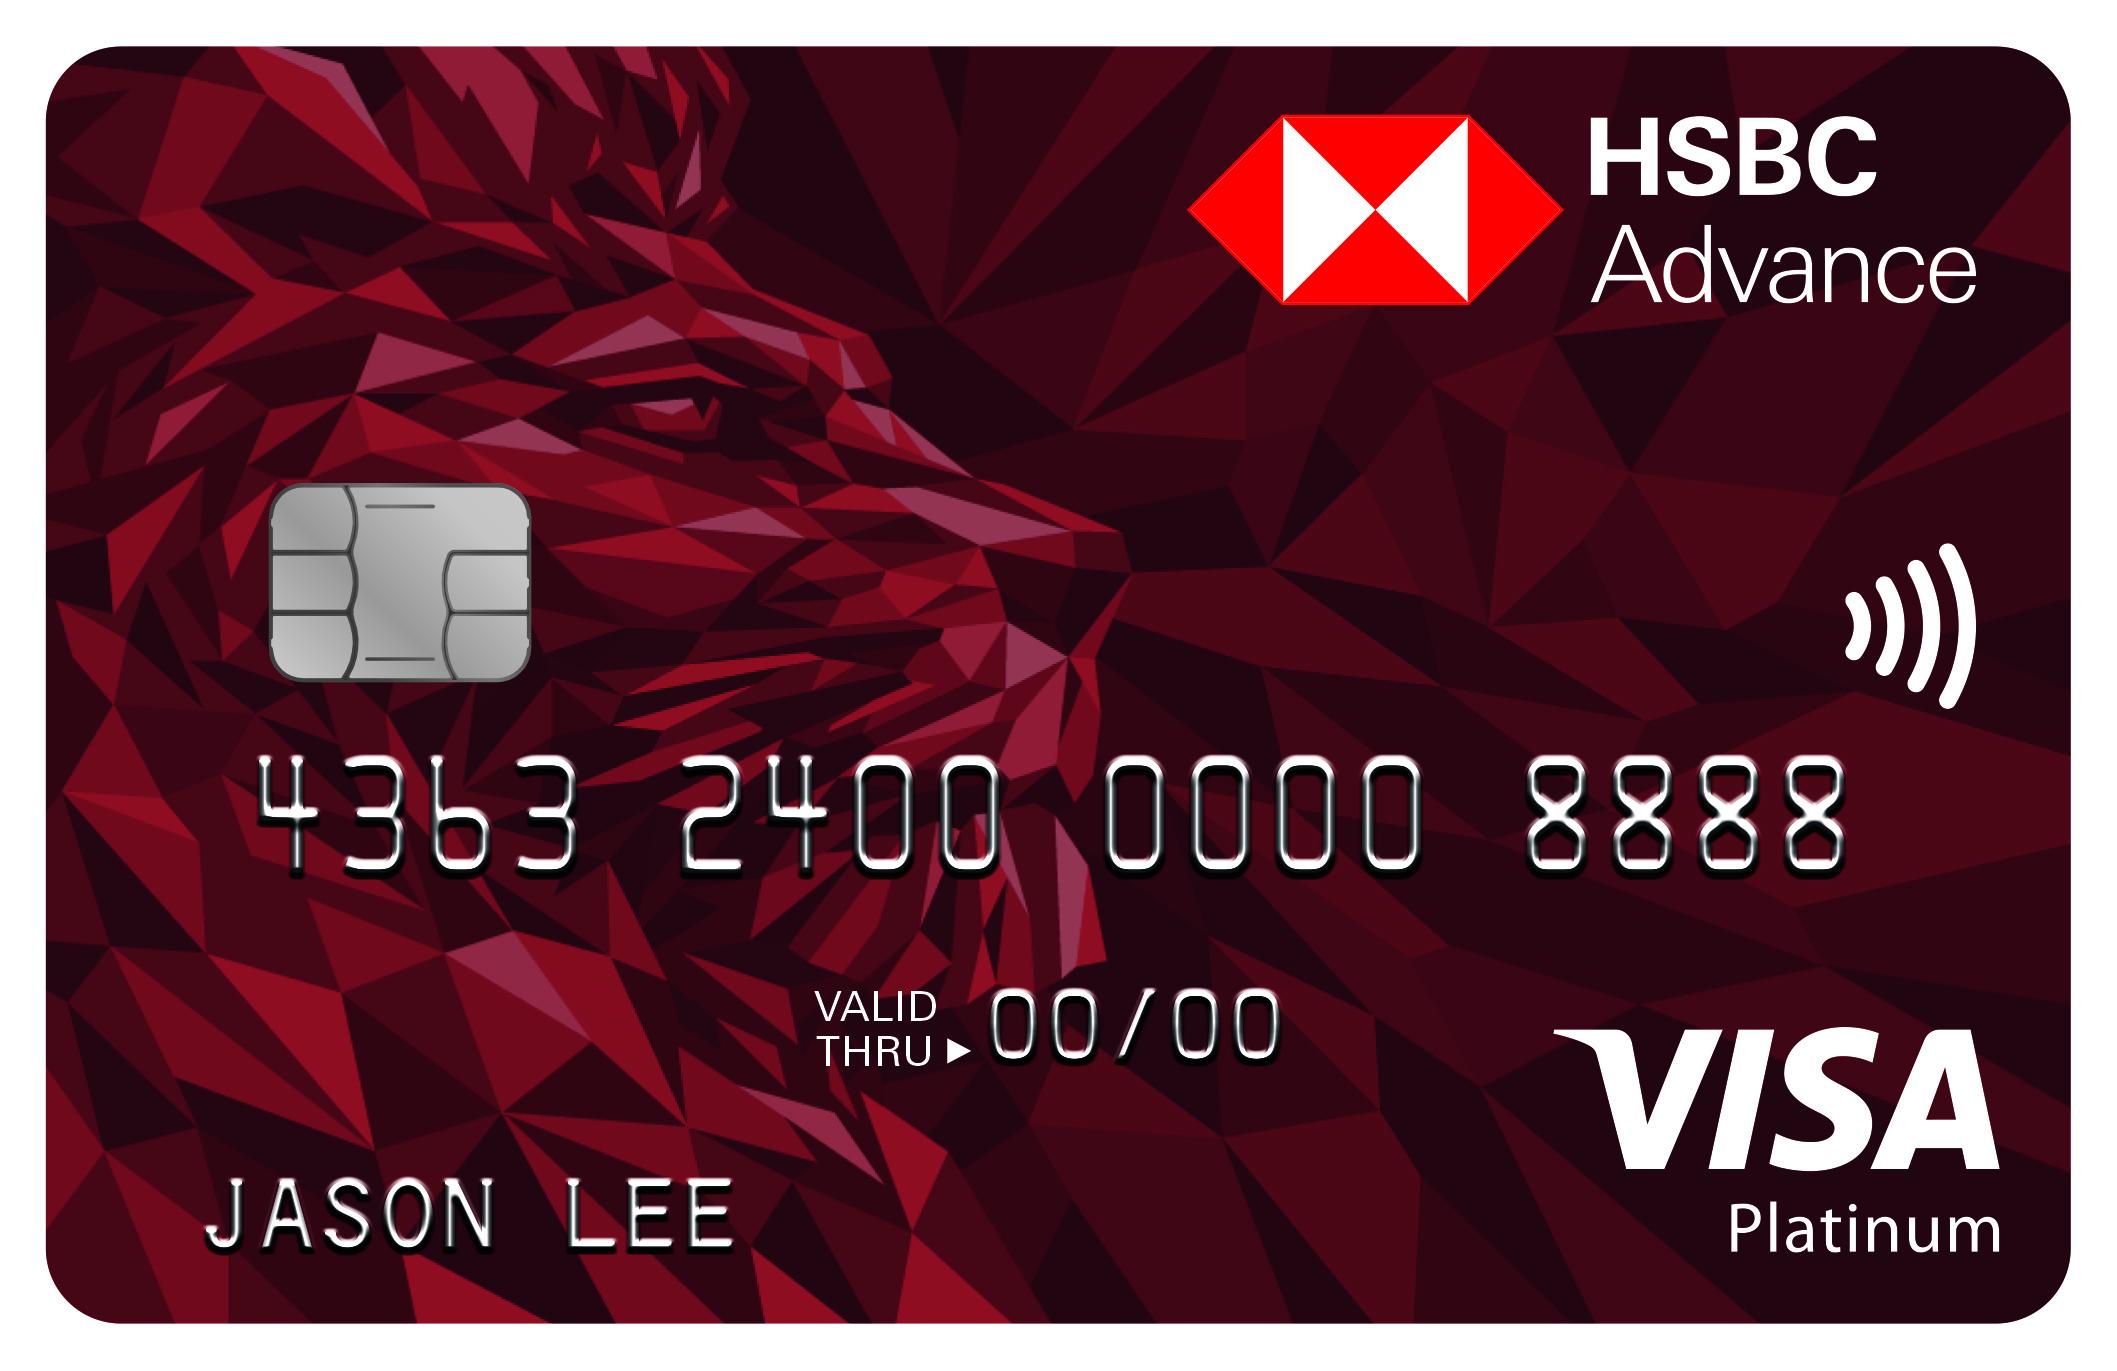 Tarjeta HSBC Advance Visa Platinum